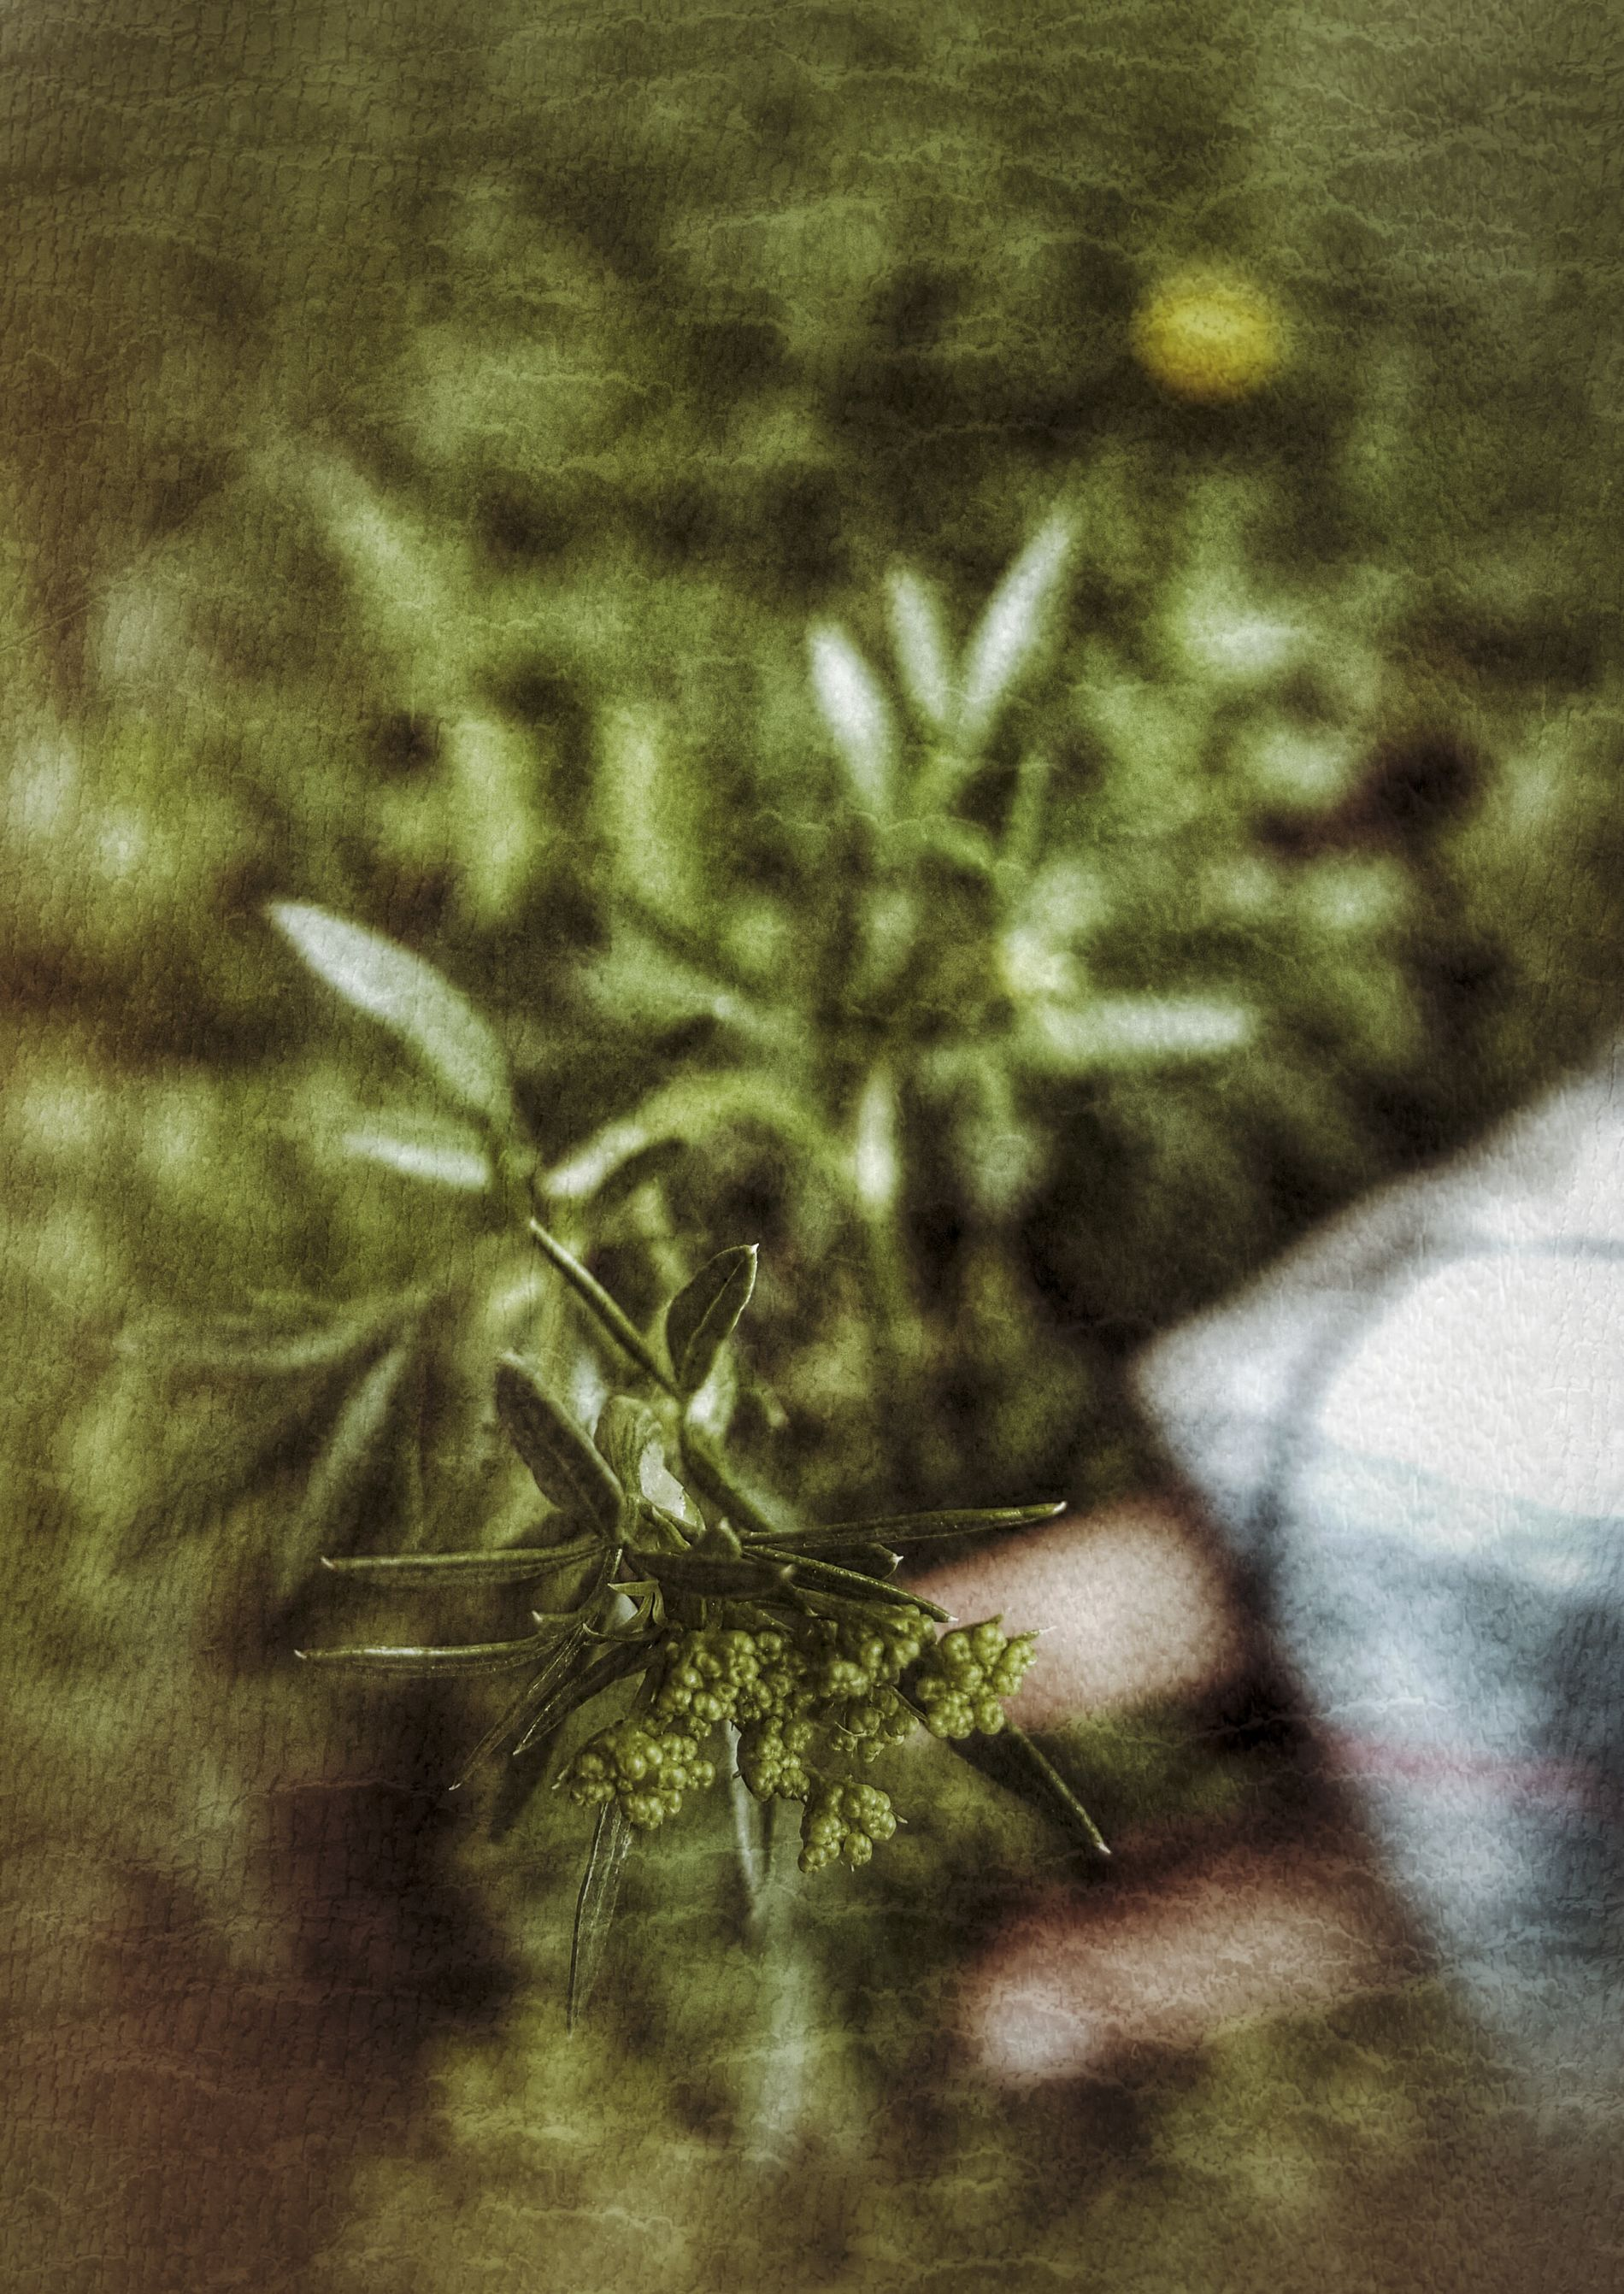 Dramatic Angles Mysterious Hand Mysterious Green Natural Selective Focus Natural Pattern Plant Single Flower Detail Nature Beauty In Nature Artistic Turkey Türkiye Turkeyphotooftheday Turkishfollowers Turk Turkish Geyve Sakarya